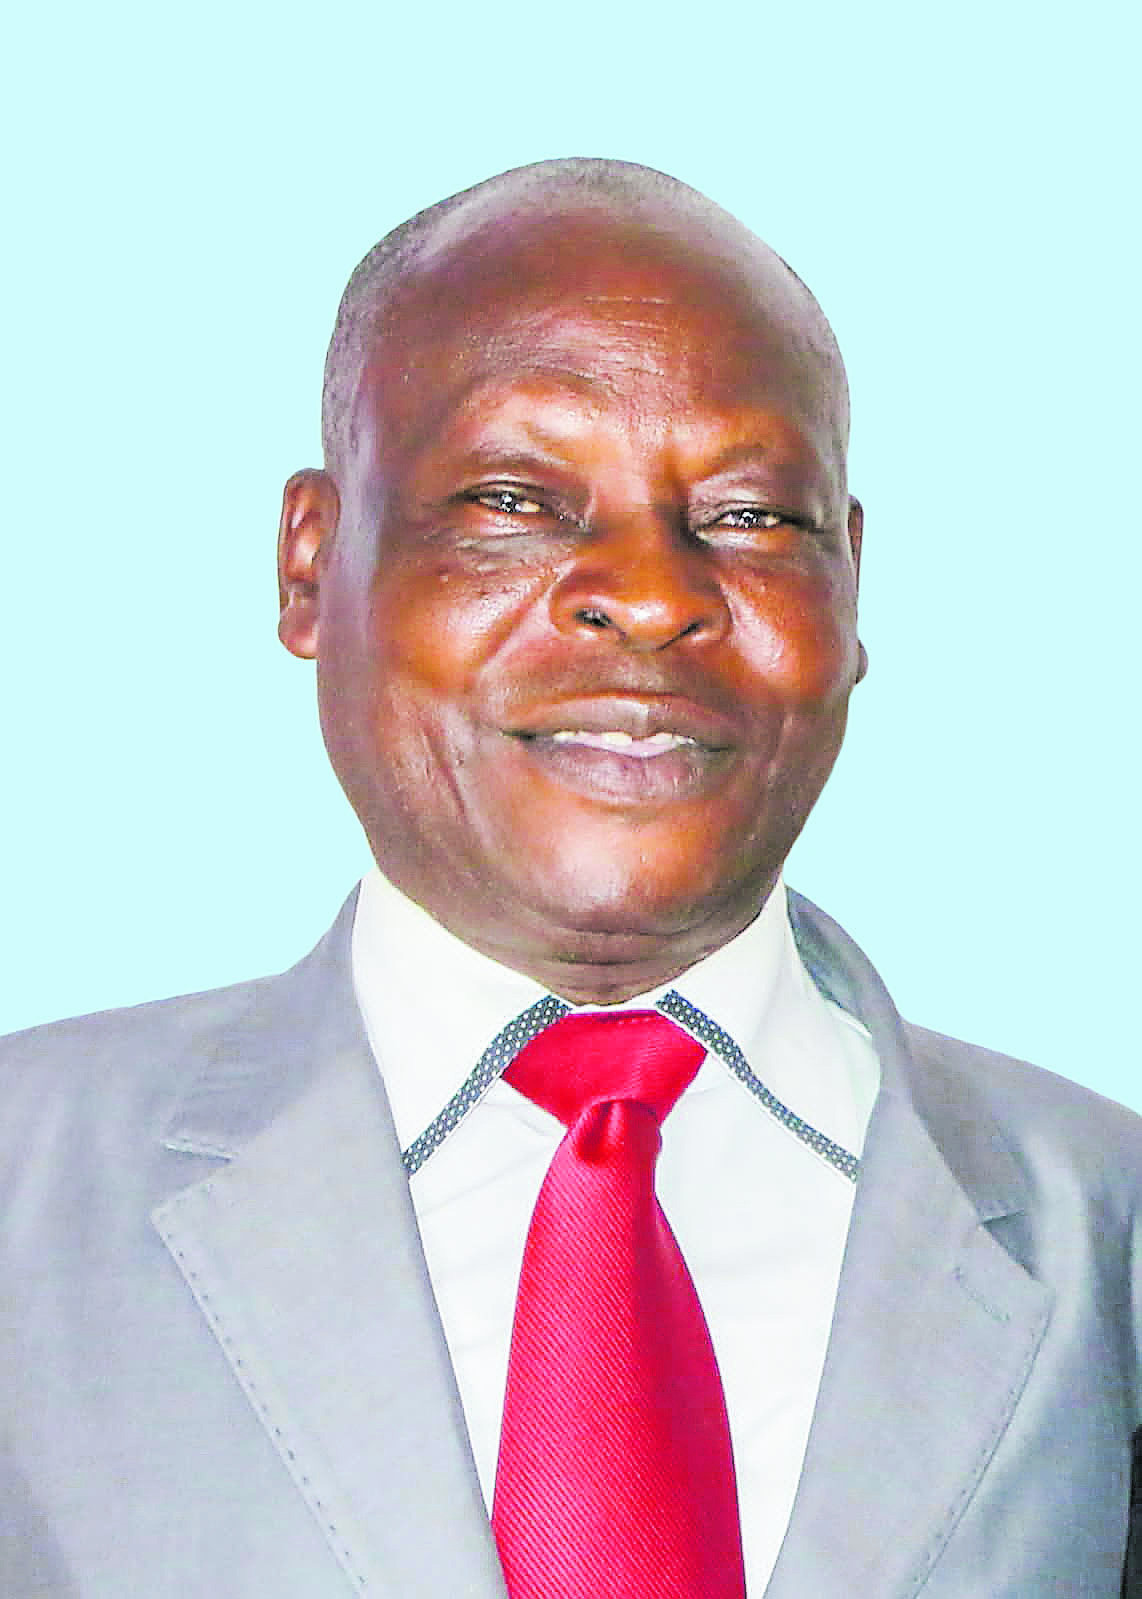 Jacob Odhiambo Kimori